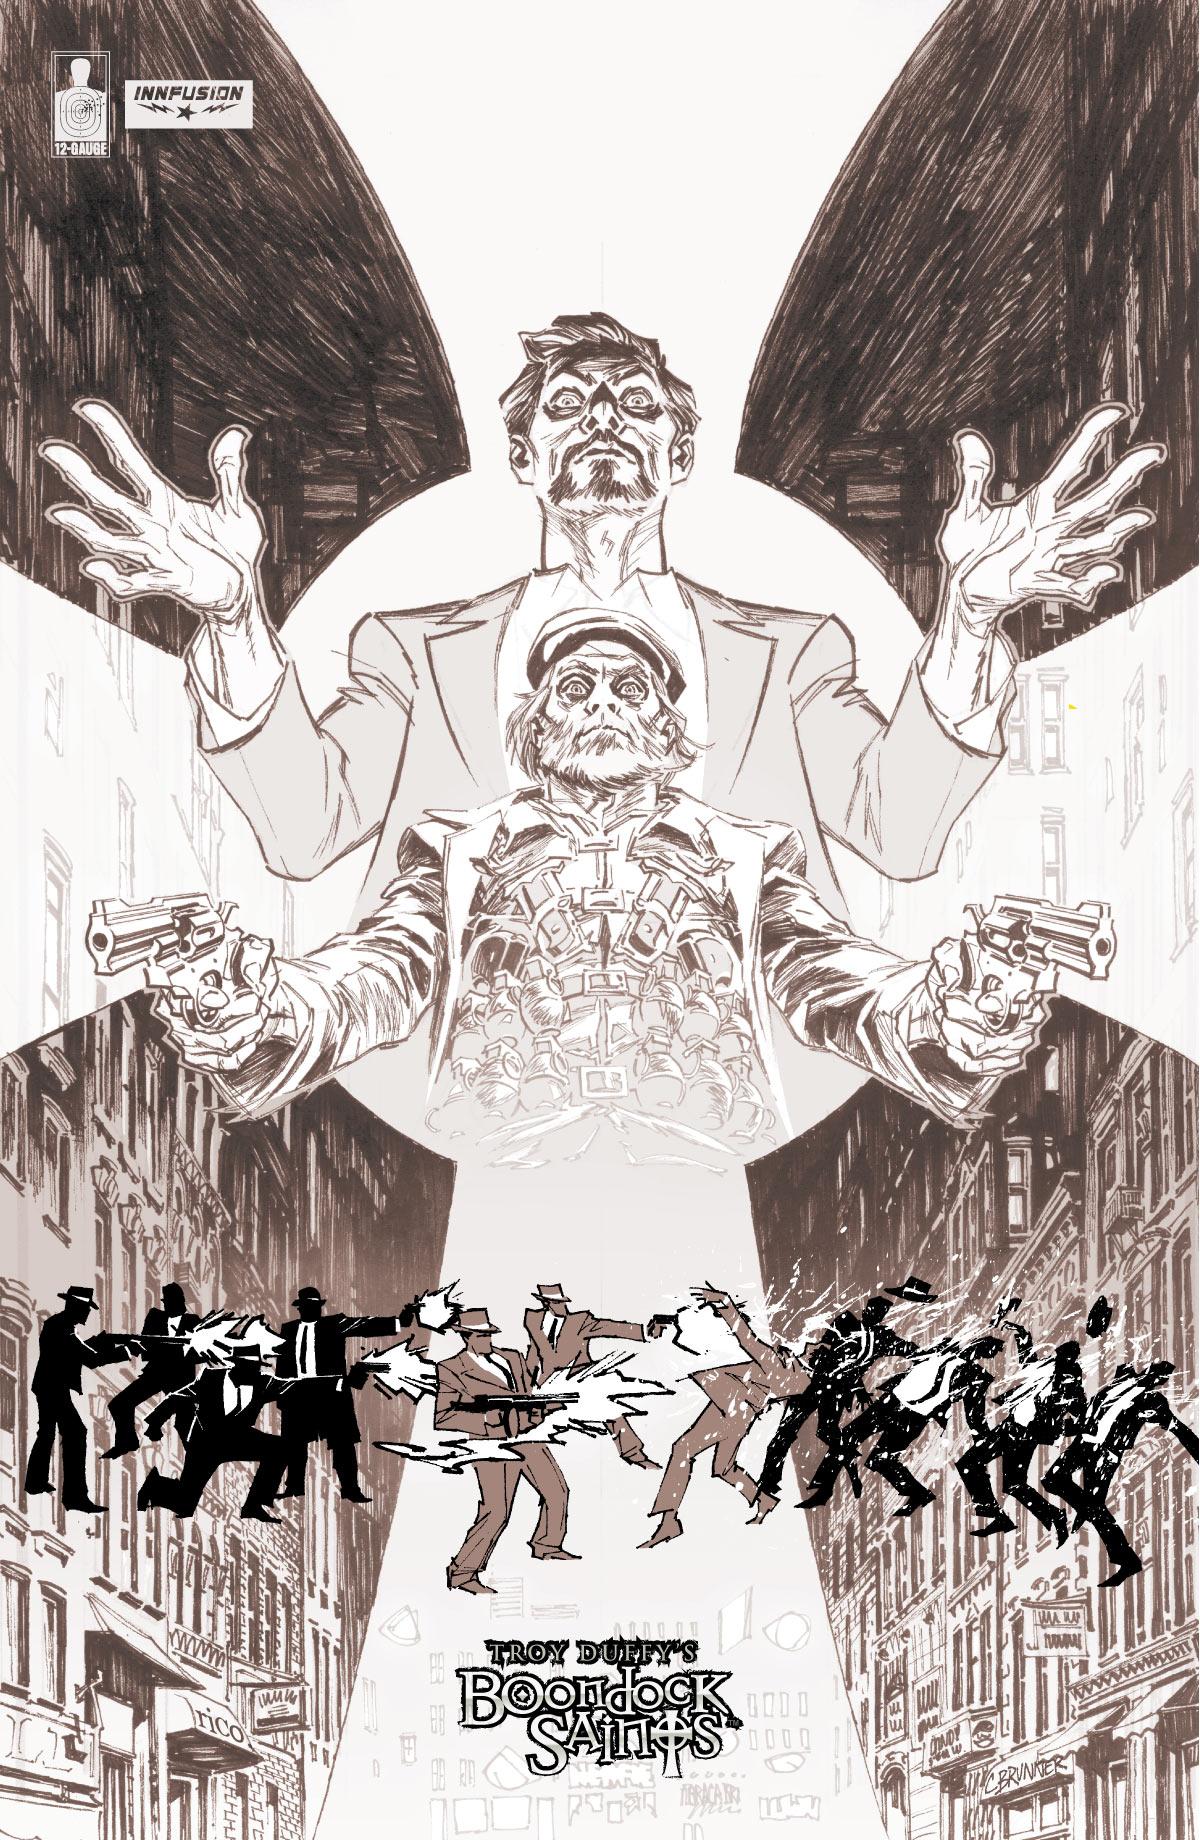 Boondock Saints : In Nomine Patris #5